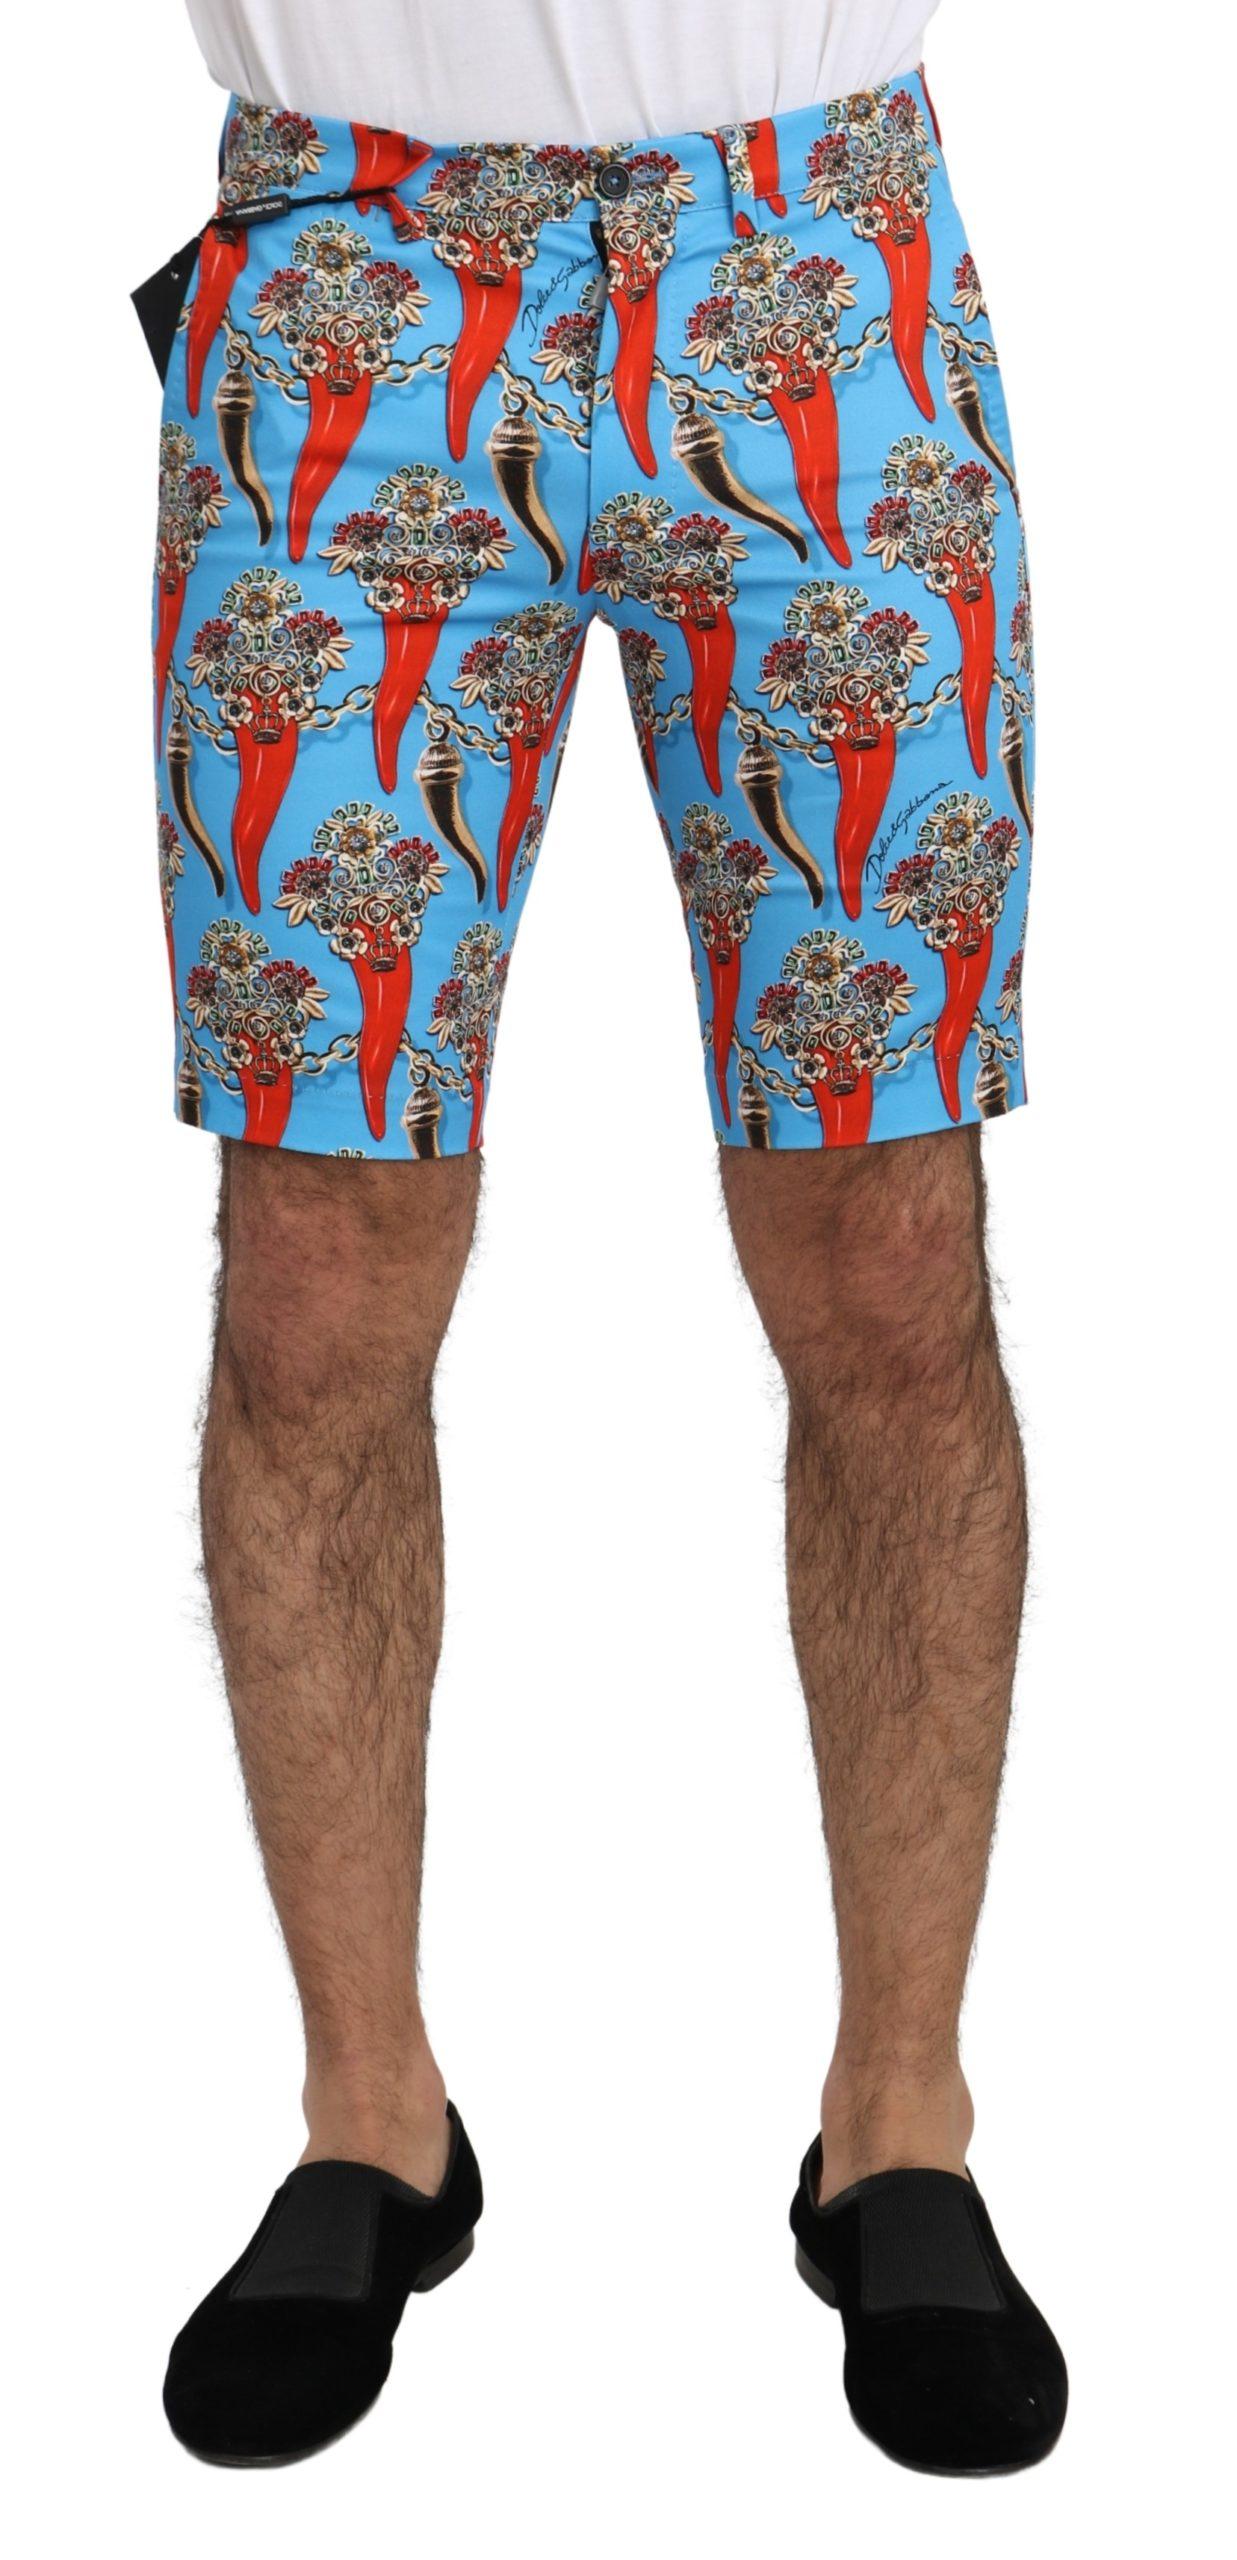 Dolce & Gabbana Men's Cotton Stretch Casual Royal Chili Shorts Blue PAN71284 - IT44 | XS